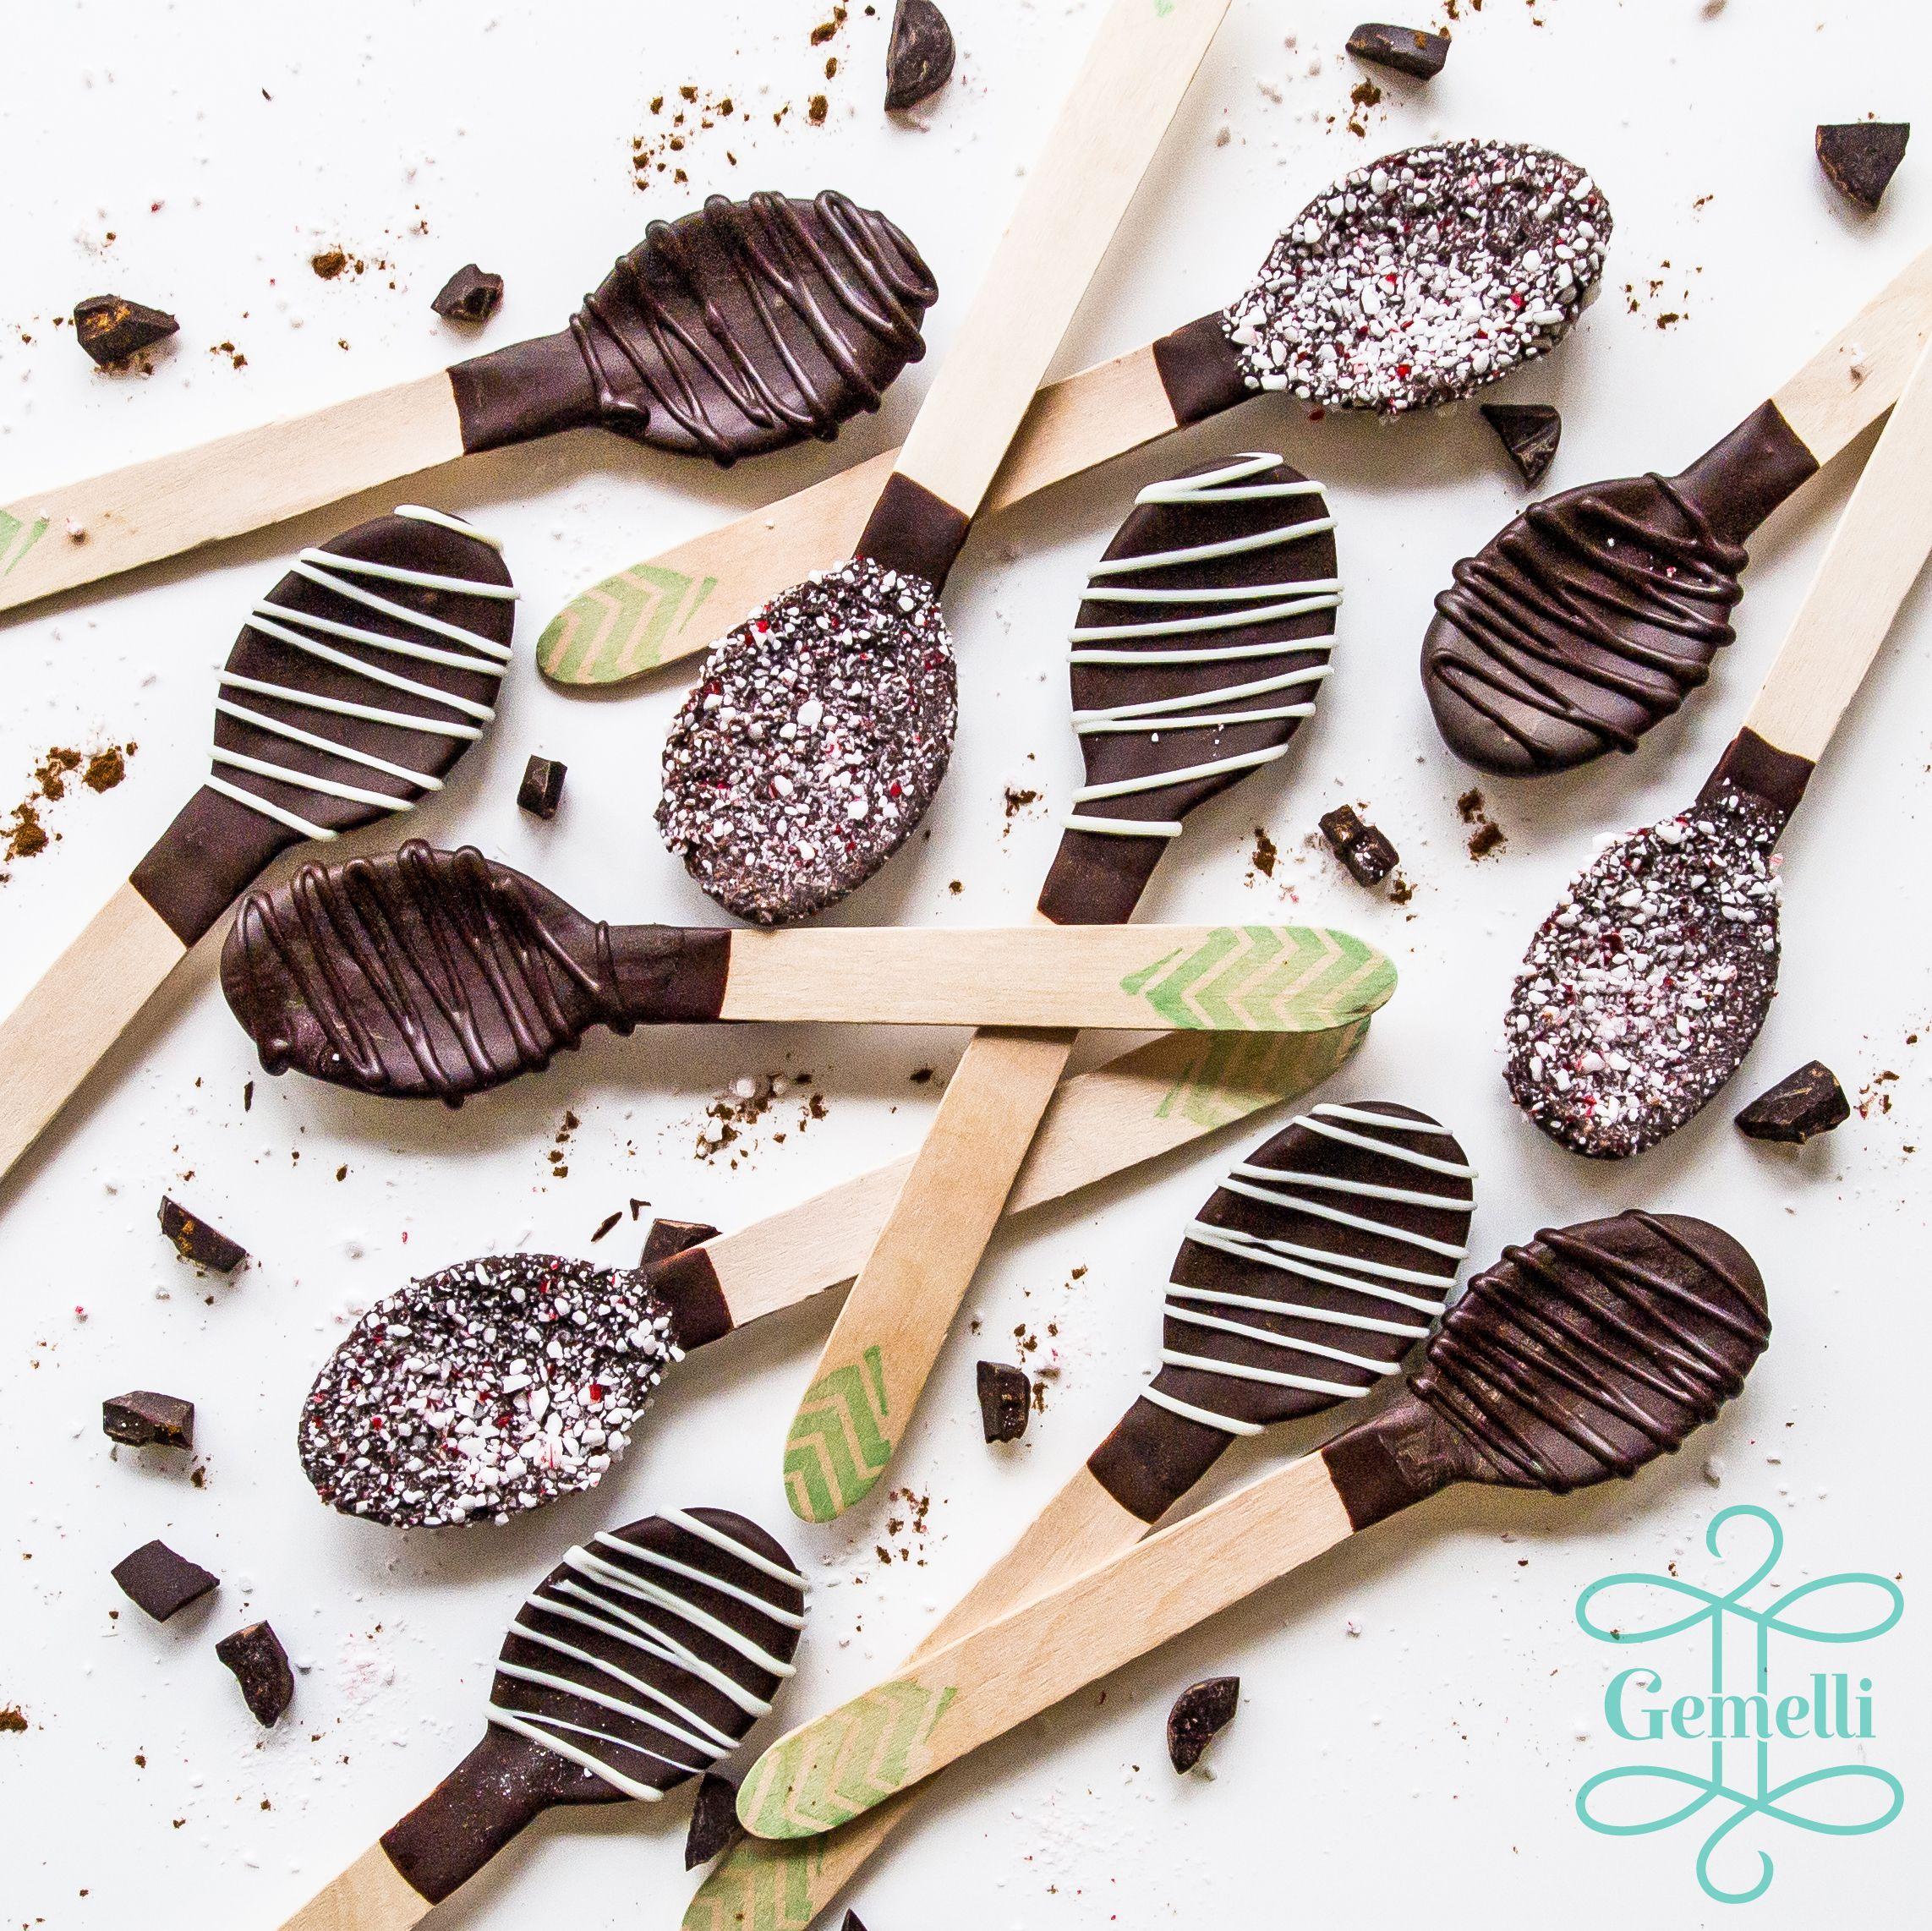 Gemelli Gelato u Dessert Cafe gemelligelato on Pinterest